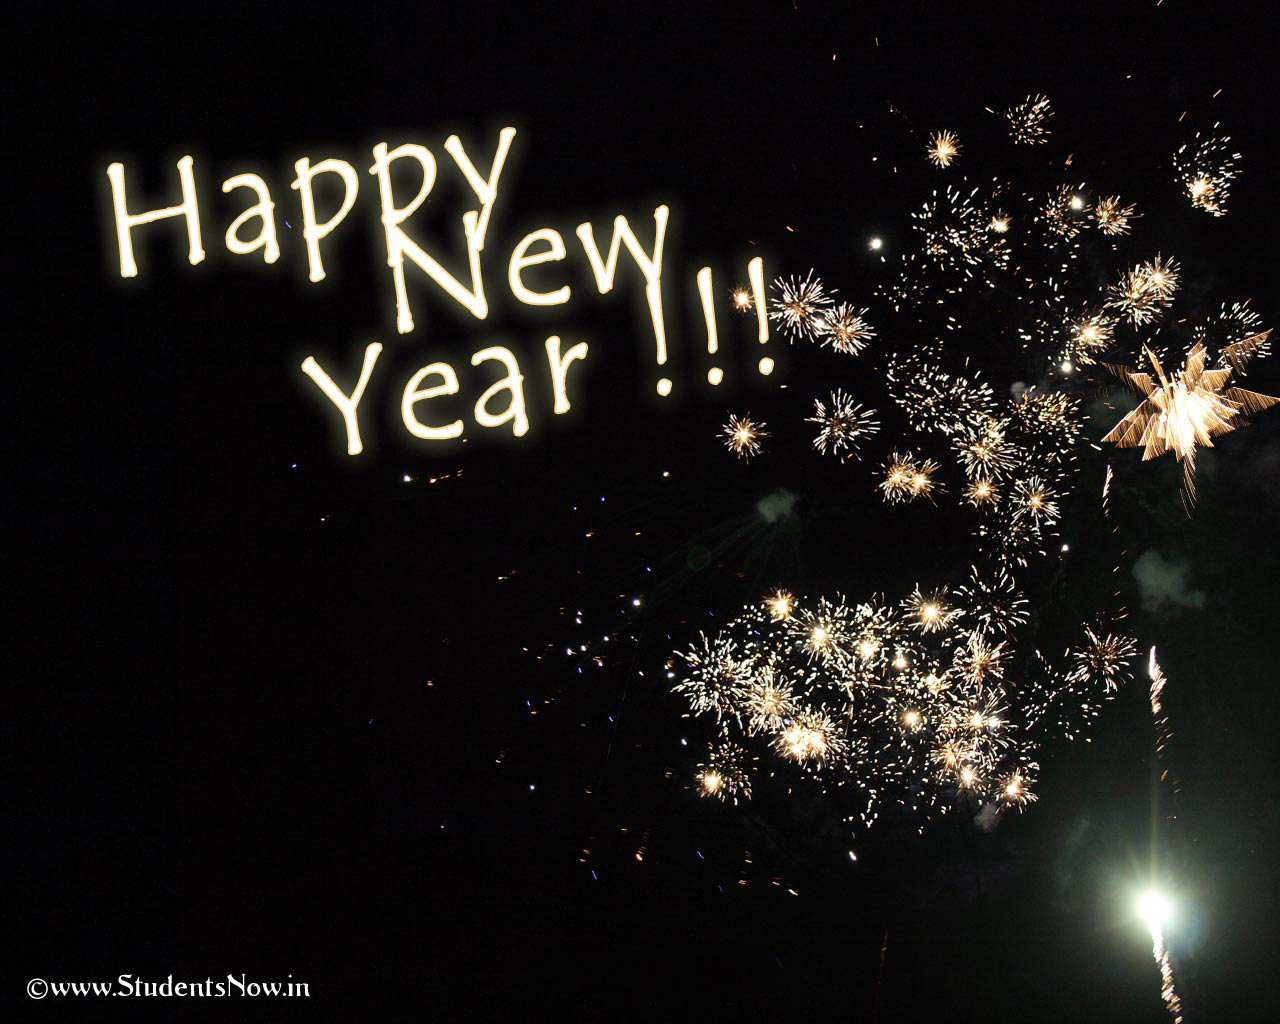 http://1.bp.blogspot.com/-tng1dgfzxOc/ULsl8BJGlPI/AAAAAAAAPwg/oVV31st_6aM/s1600/New+Year+Wallapeprs+-++2013+-+StudentsNow.in.+(5).jpg